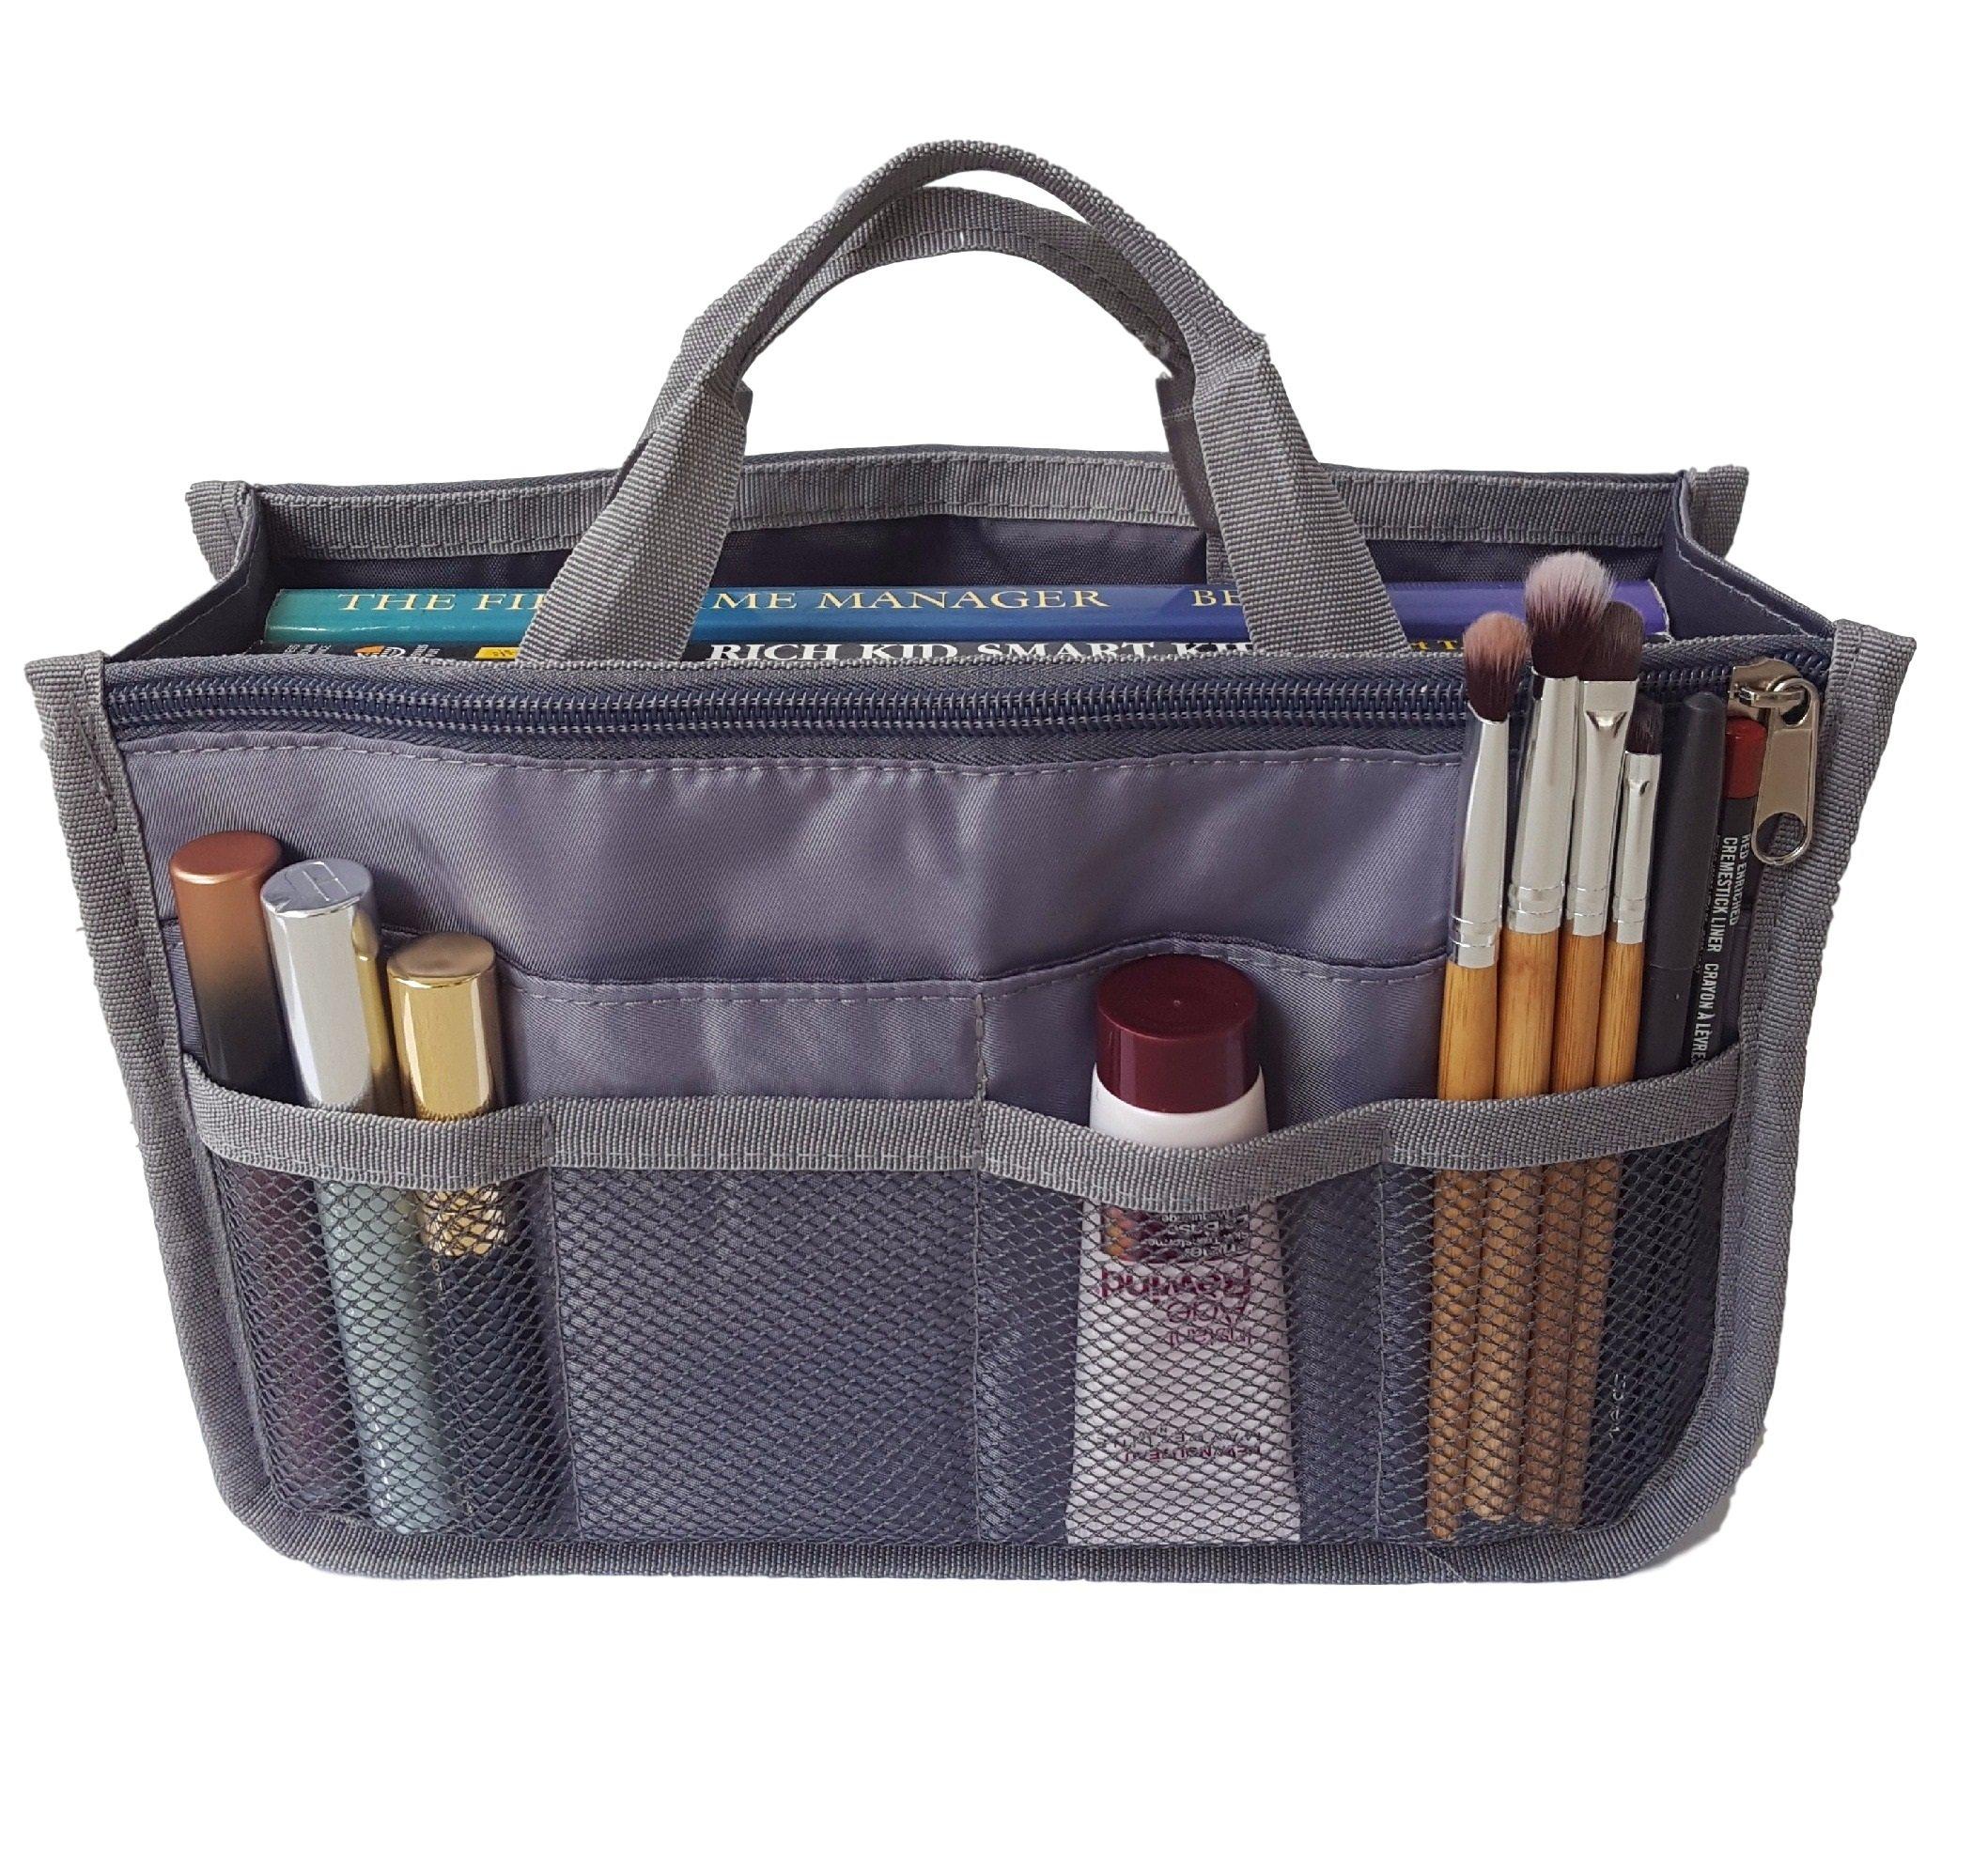 RW Collections Handbag Organizer, Liner, Sturdy Nylon Purse Insert (Medium, Grey)